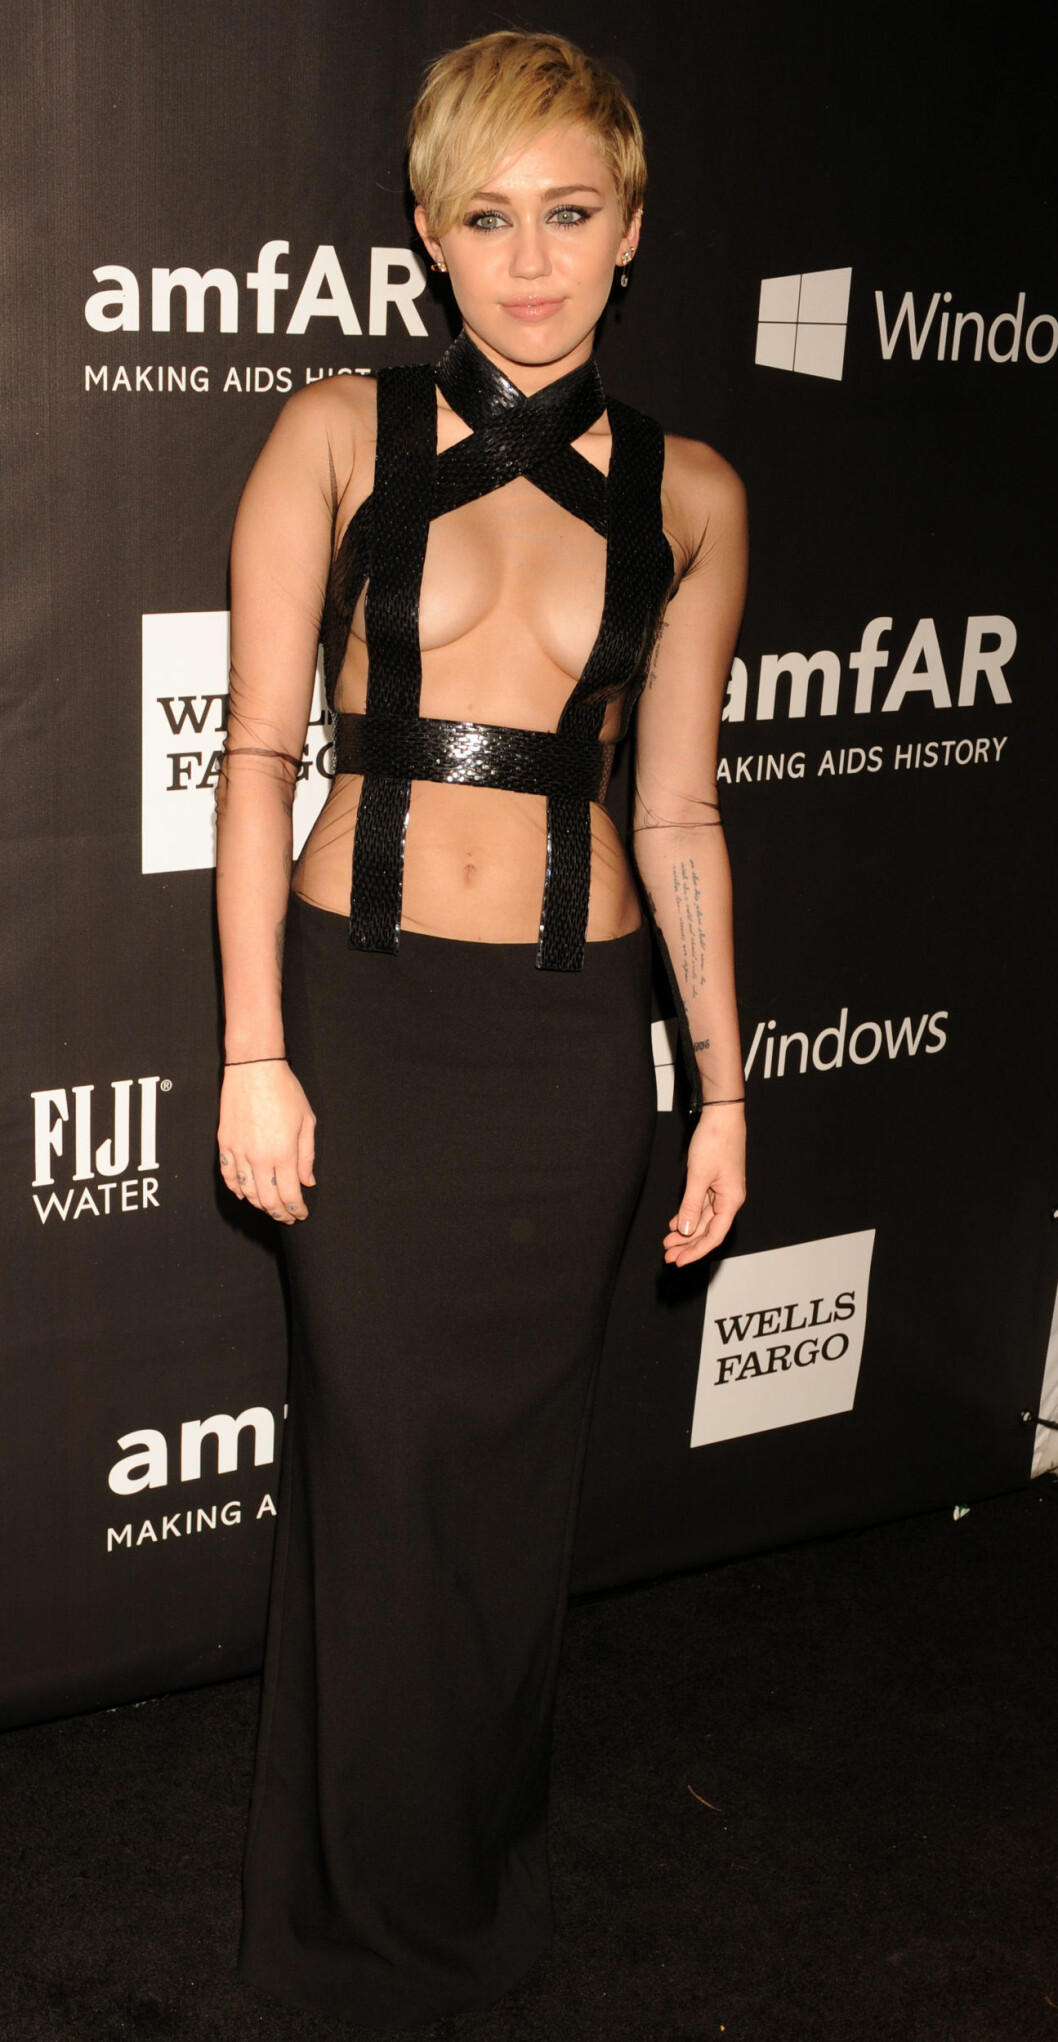 <strong>«TOPPLØS» TIL 2:</strong> Miley Cyrus viste det meste på amfAR-gallaen i Hollywood i slutten av oktober. Foto: Stella Pictures